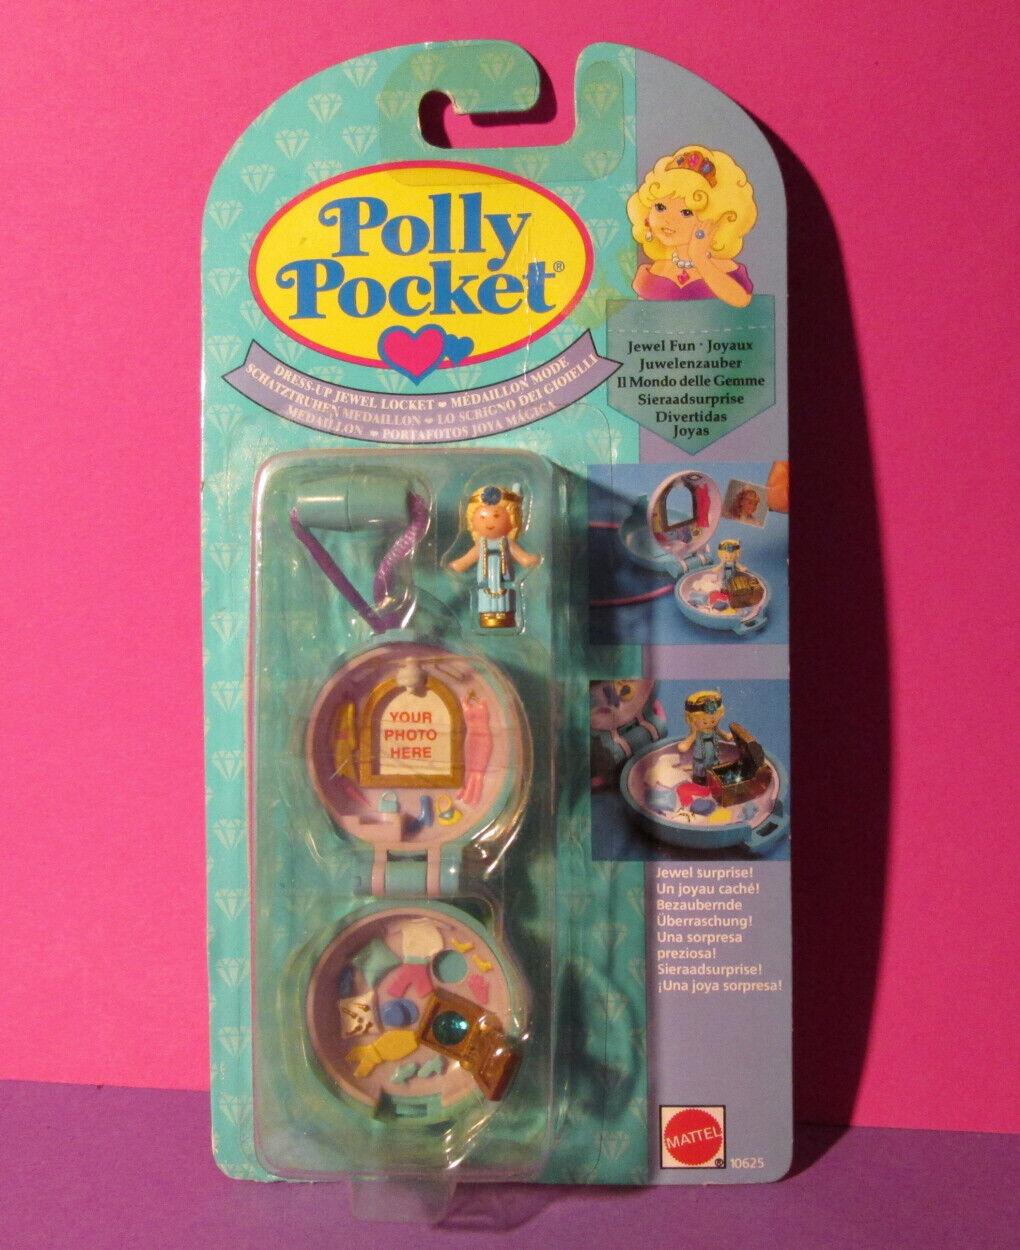 Polly Pocket Mini nuevo ♥ joya cadena ♥ dress up Jewel Locket ♥ OVP ♥ 1992 ♥ New ♥